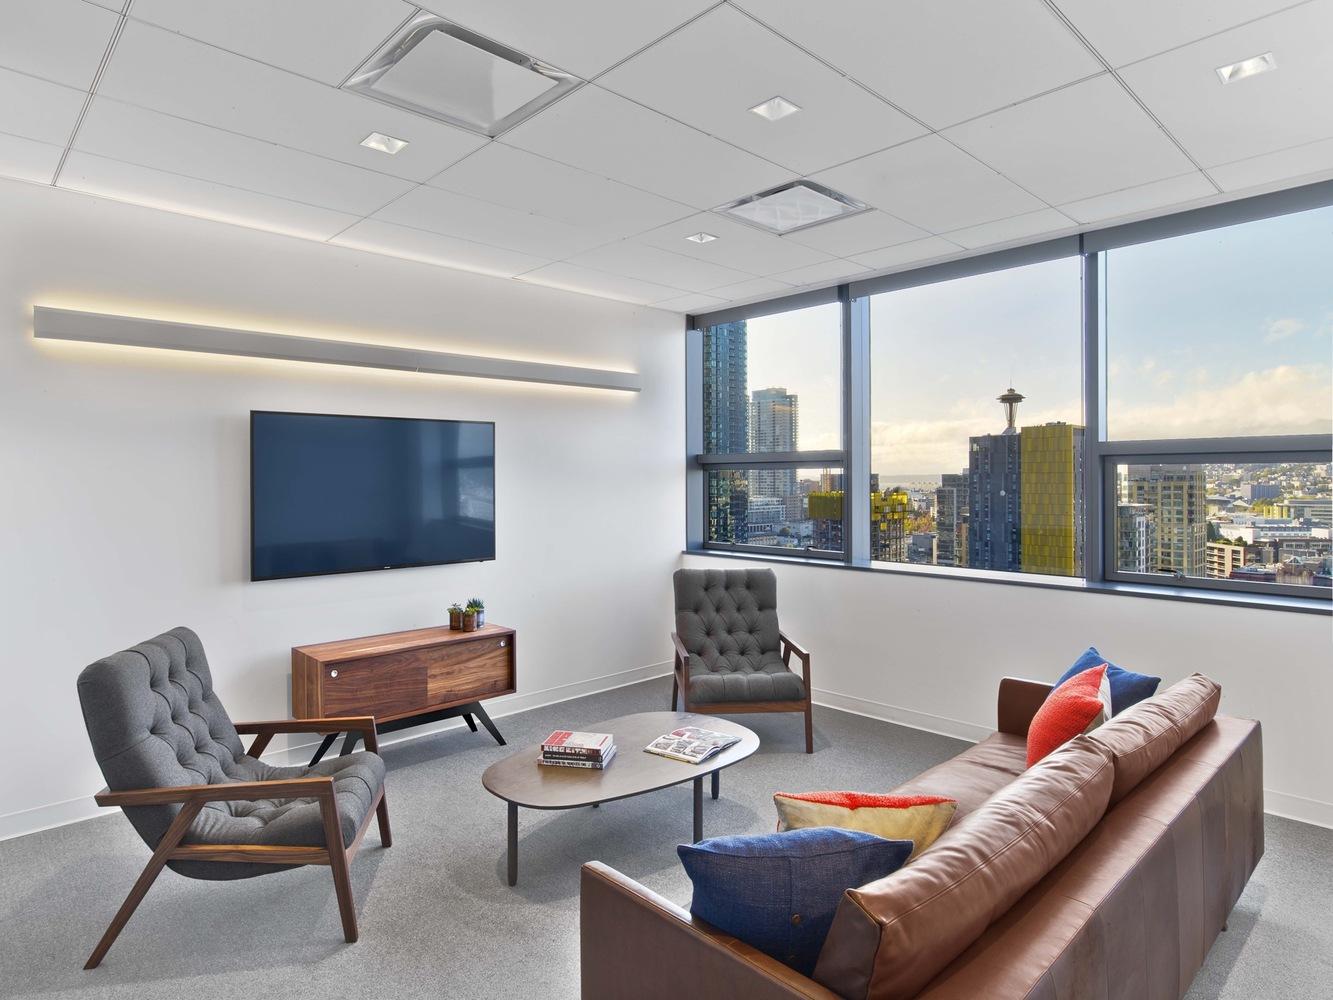 Gallery of HBO Seattle Workspace / Rapt Studio - 41